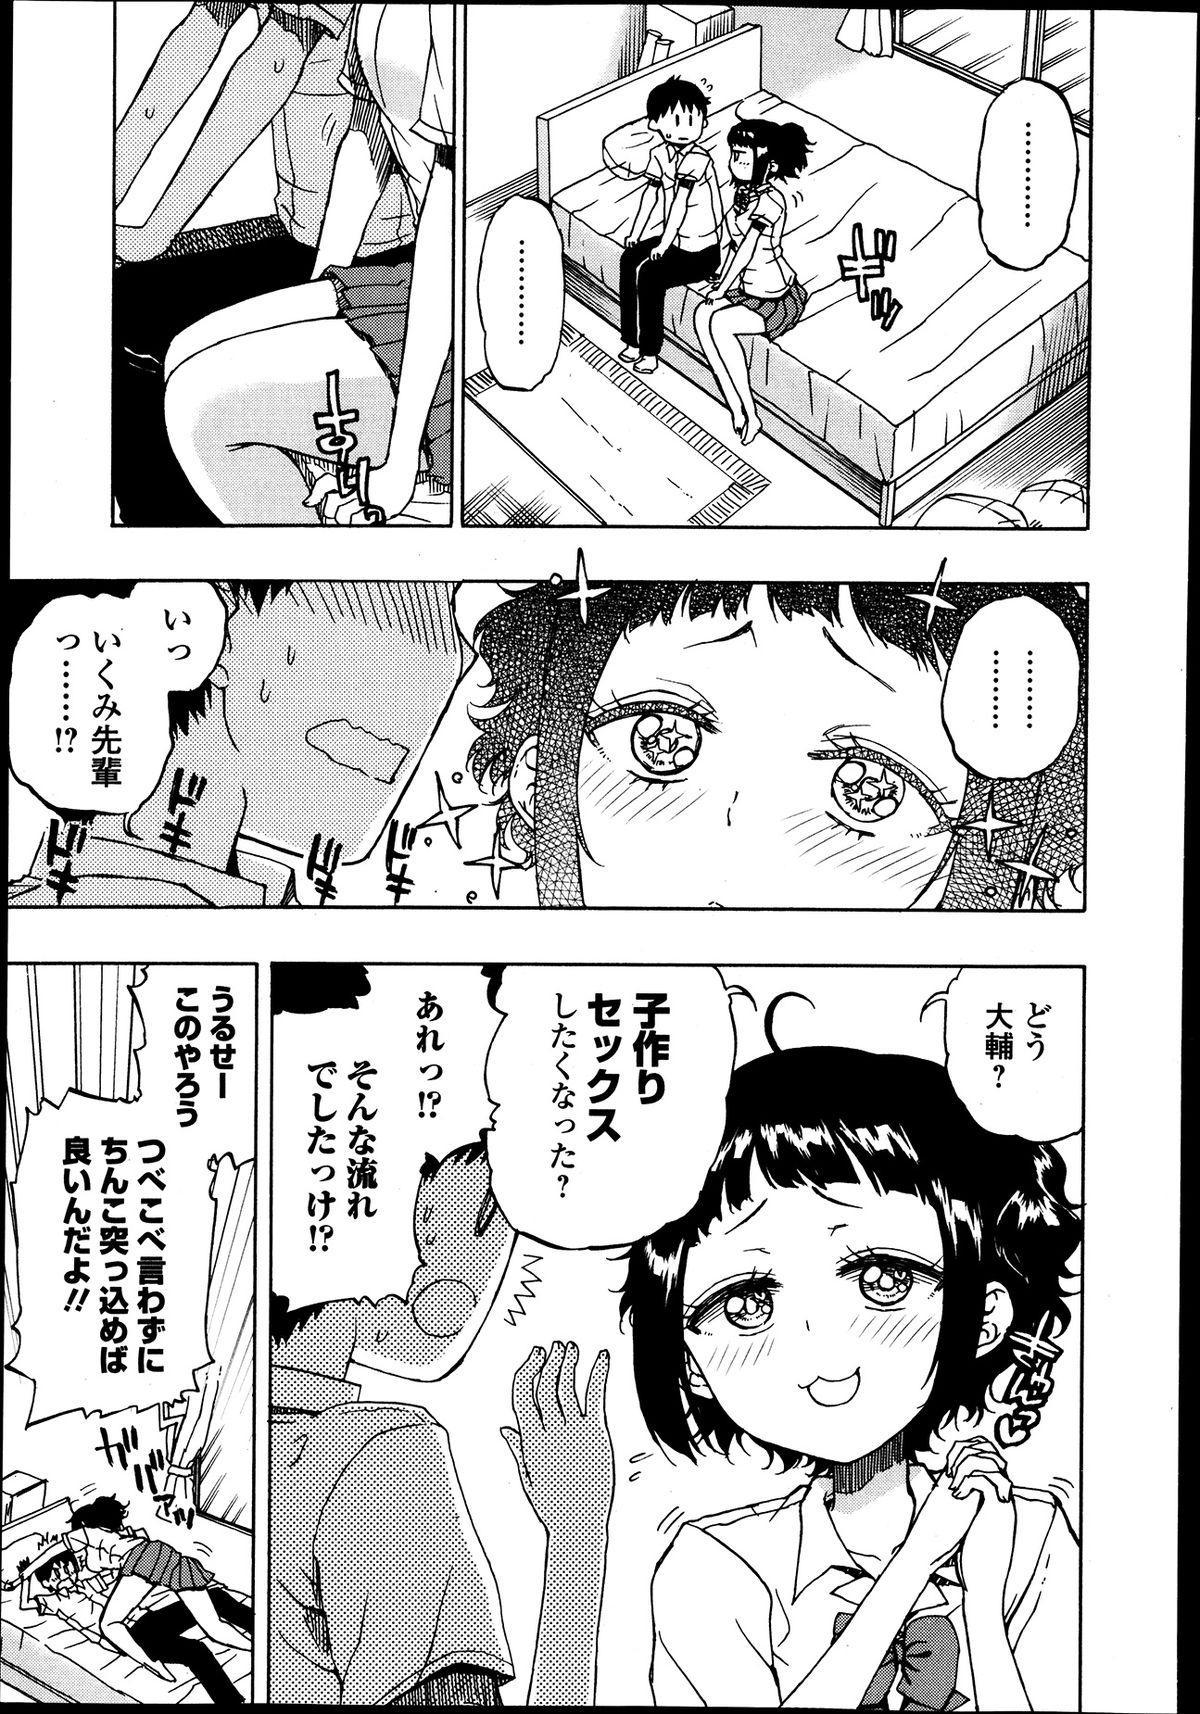 Bishoujo Kakumei KIWAME Road Vol.9 142